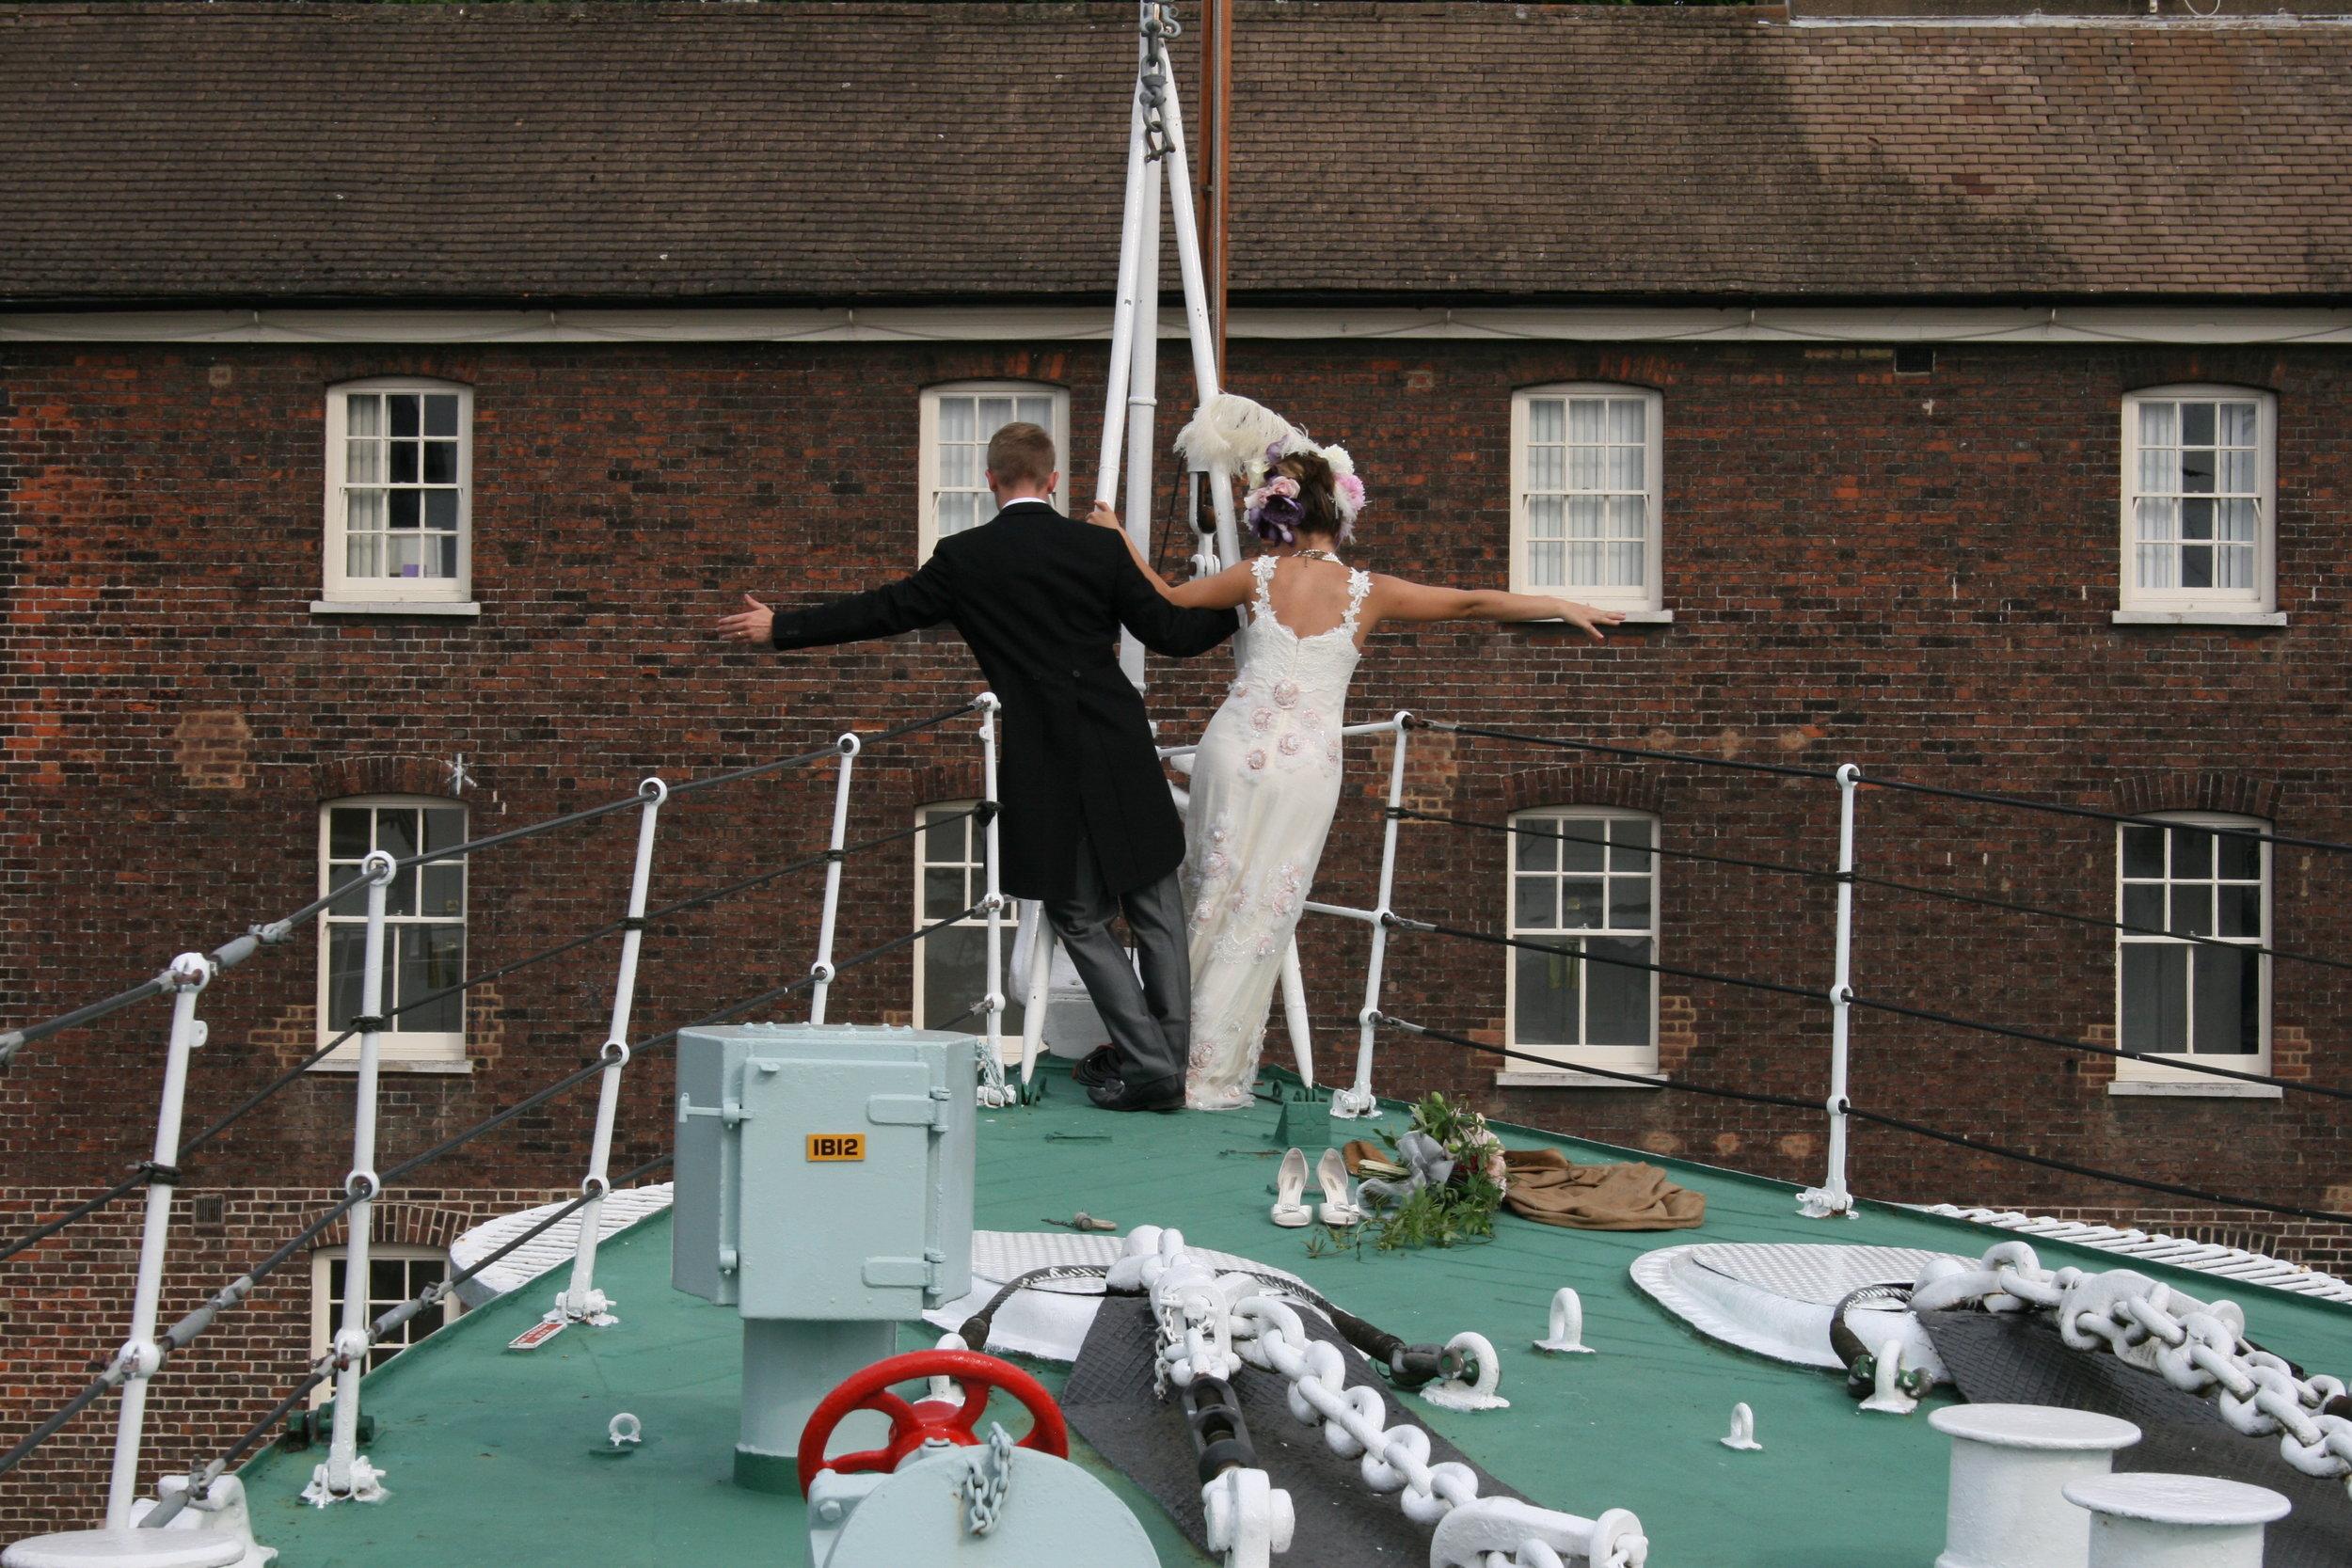 wedding shoot 2013 152.jpg